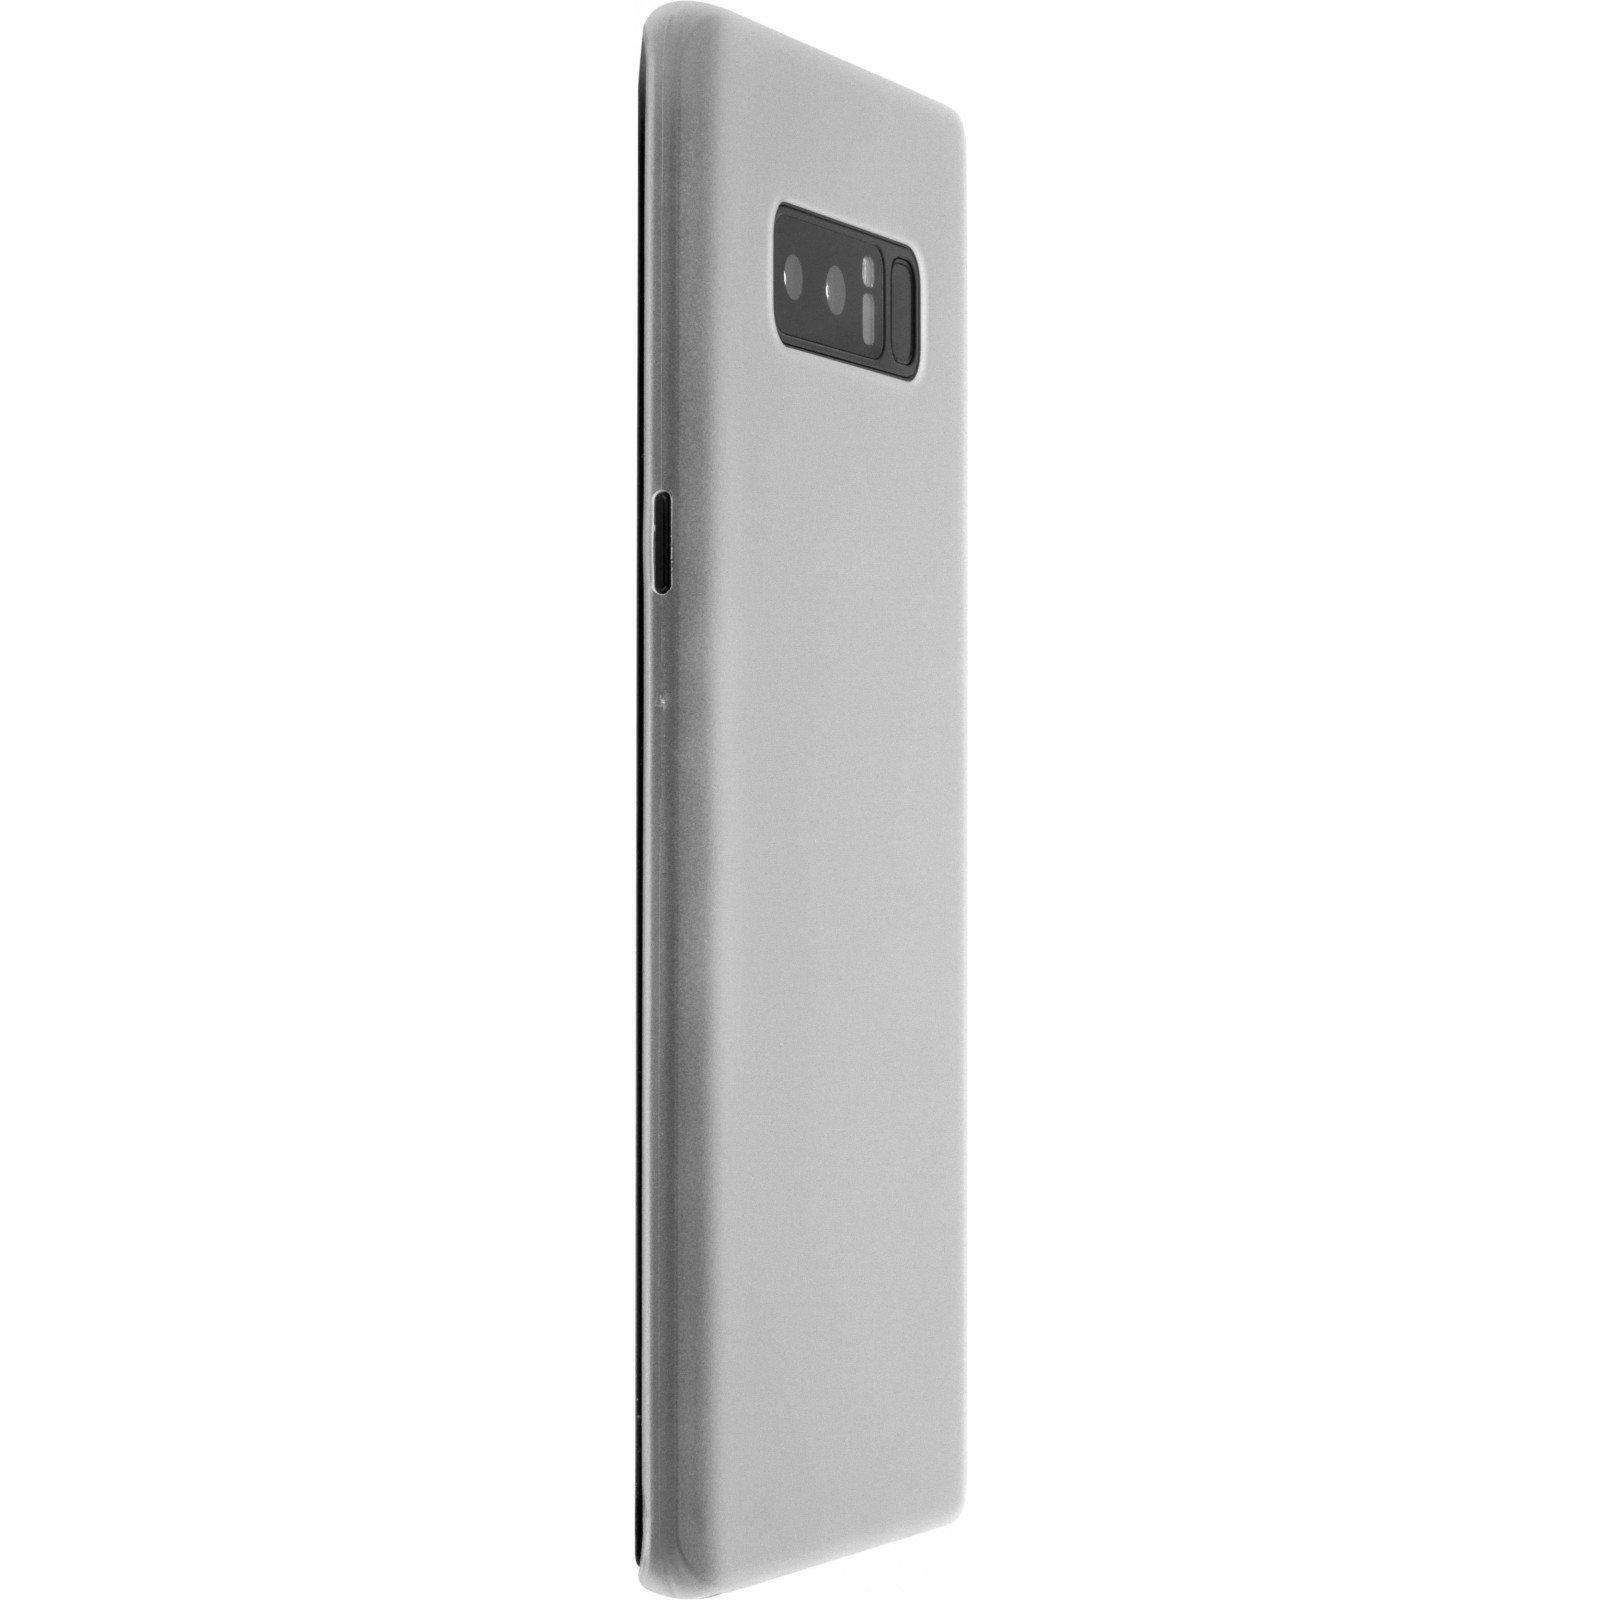 Чехол для моб. телефона MakeFuture PP/Ice Case для Samsung Note 8 White (MCI-SN8W) изображение 2